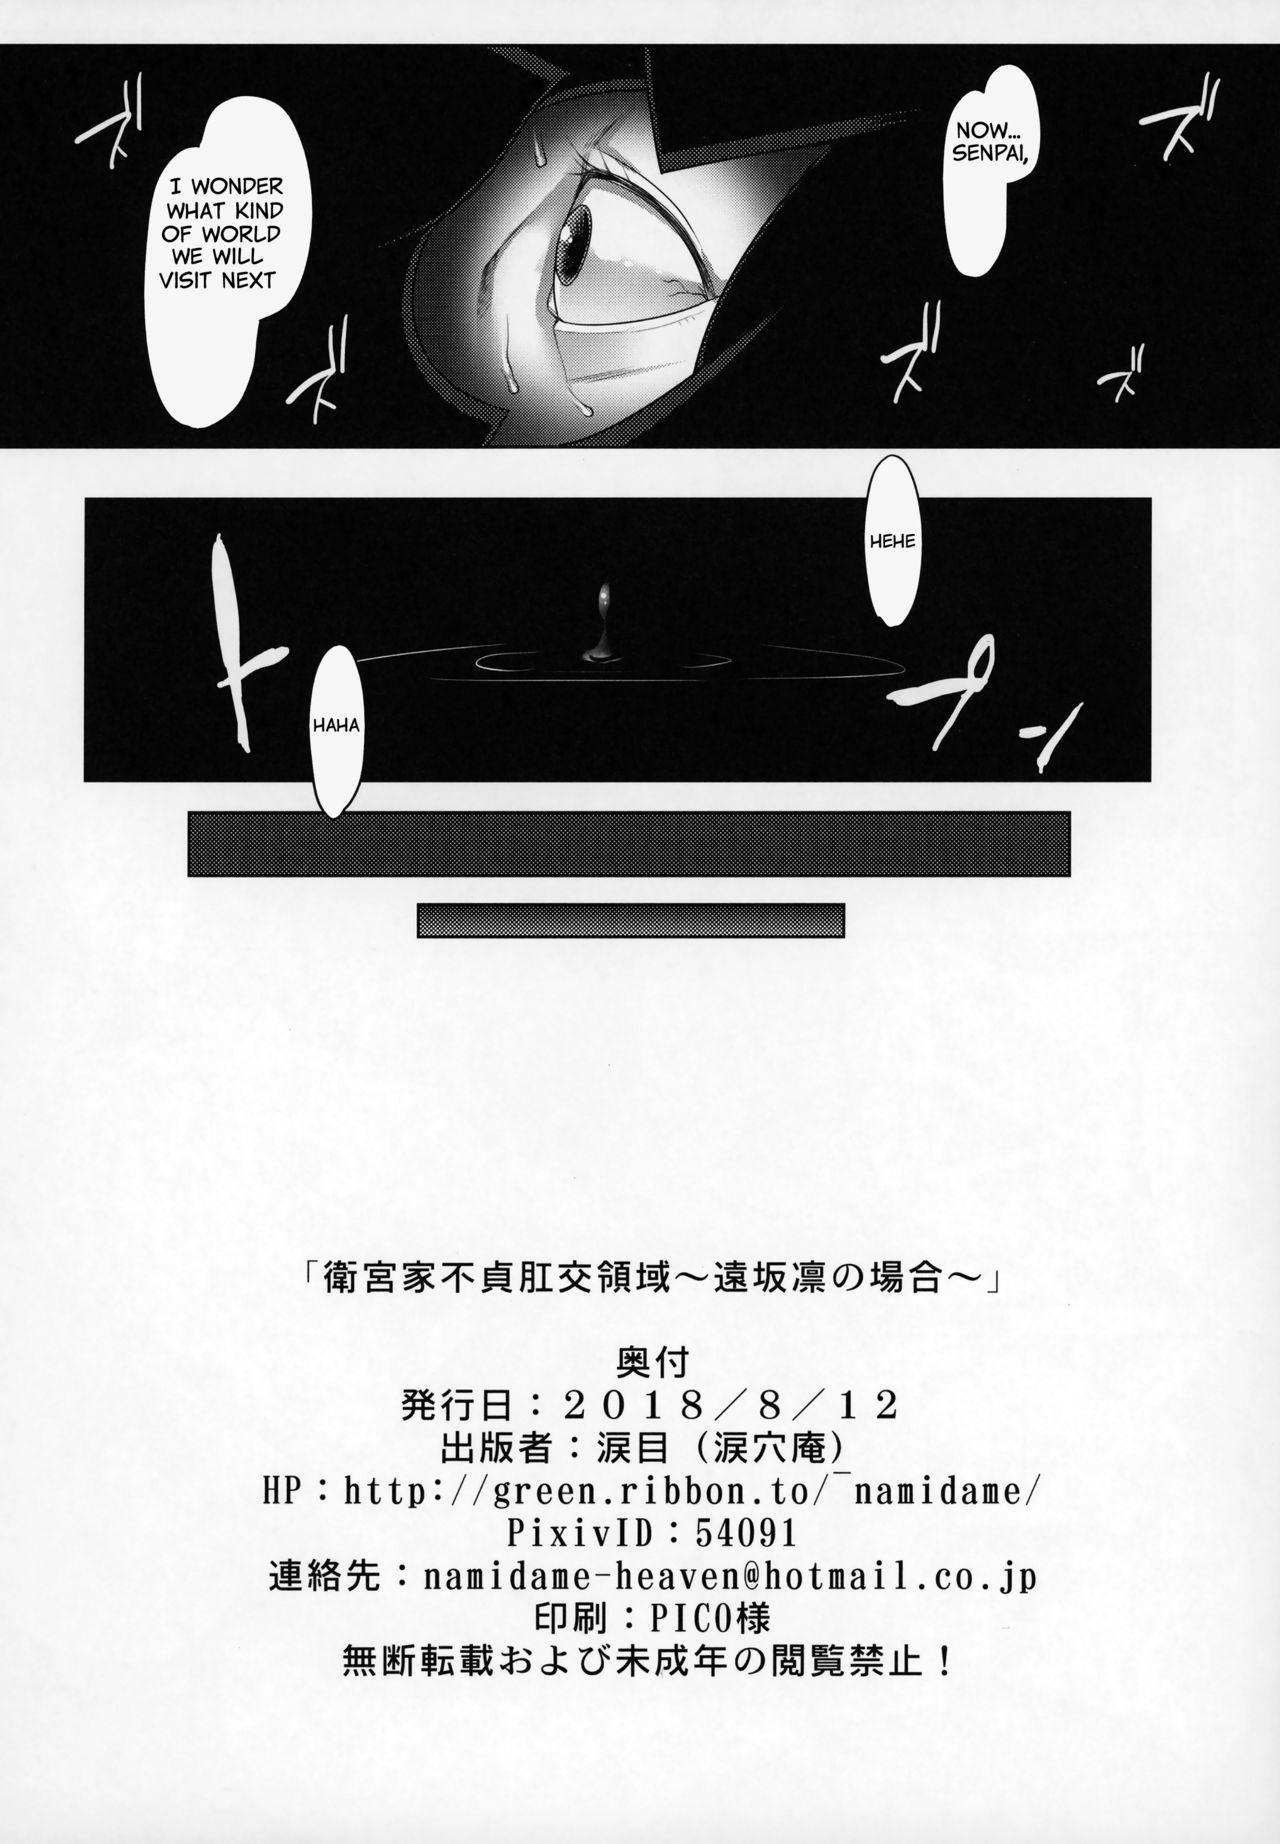 (C94) [Ruiketsuan (Namidame)] Emiya ke Futei Koukou Ryouiki ~Tosaka Rin no Baai~ (Fate/stay night) | Anal cuckolding for Emiya family ~ Tohsaka Rin Case (Fate stay night) [English] [NetorareNation] 20